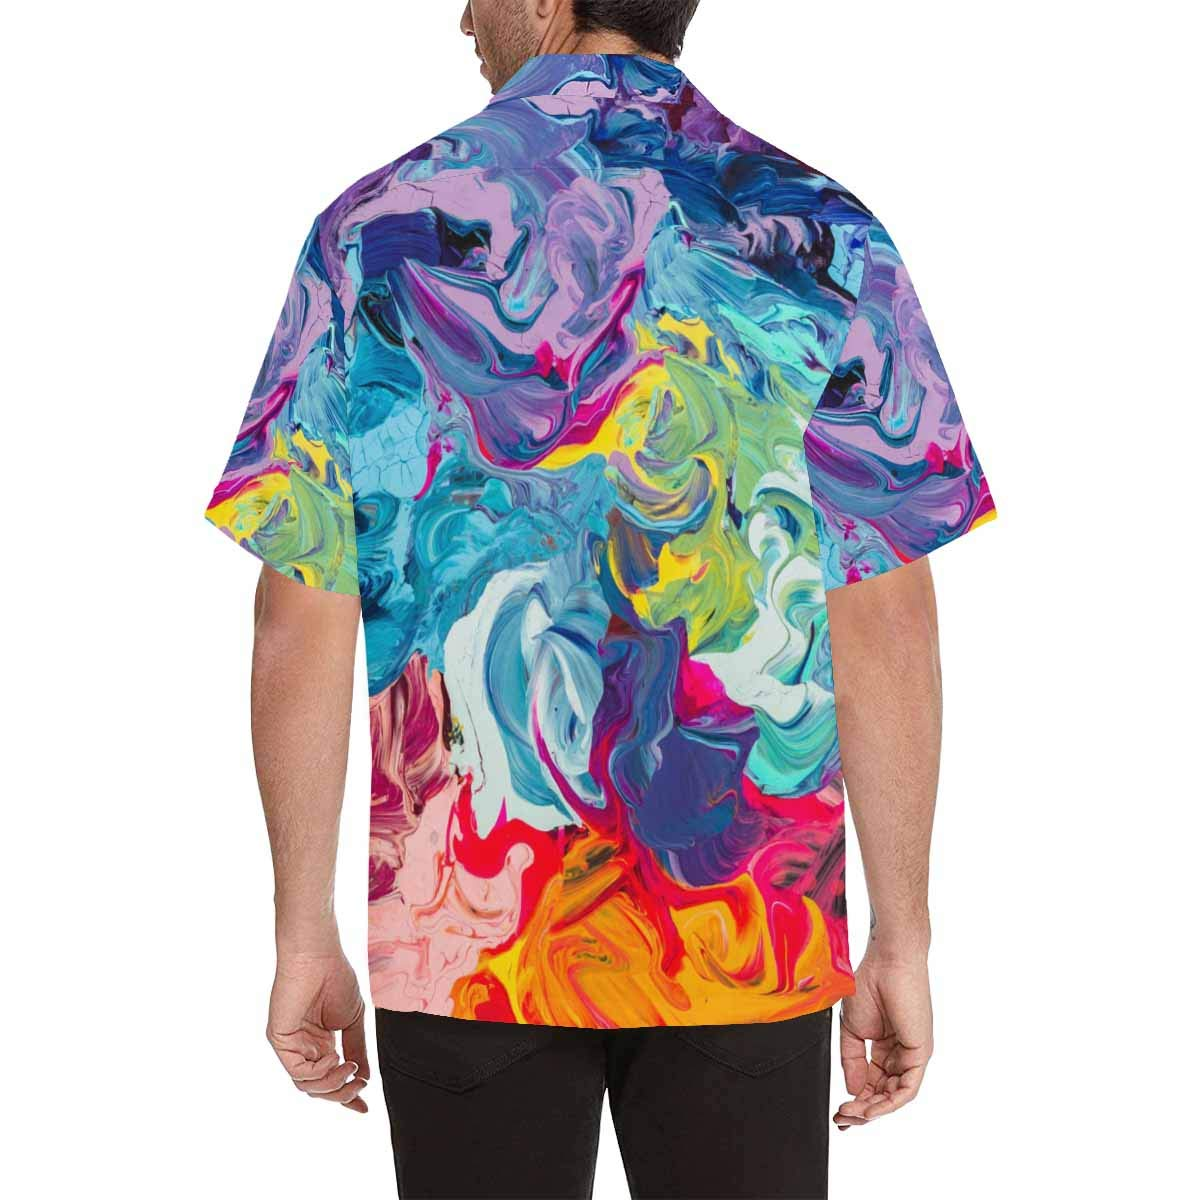 InterestPrint Beautiful Ditsy Floral Short Sleeve Button Up Casual Shirt